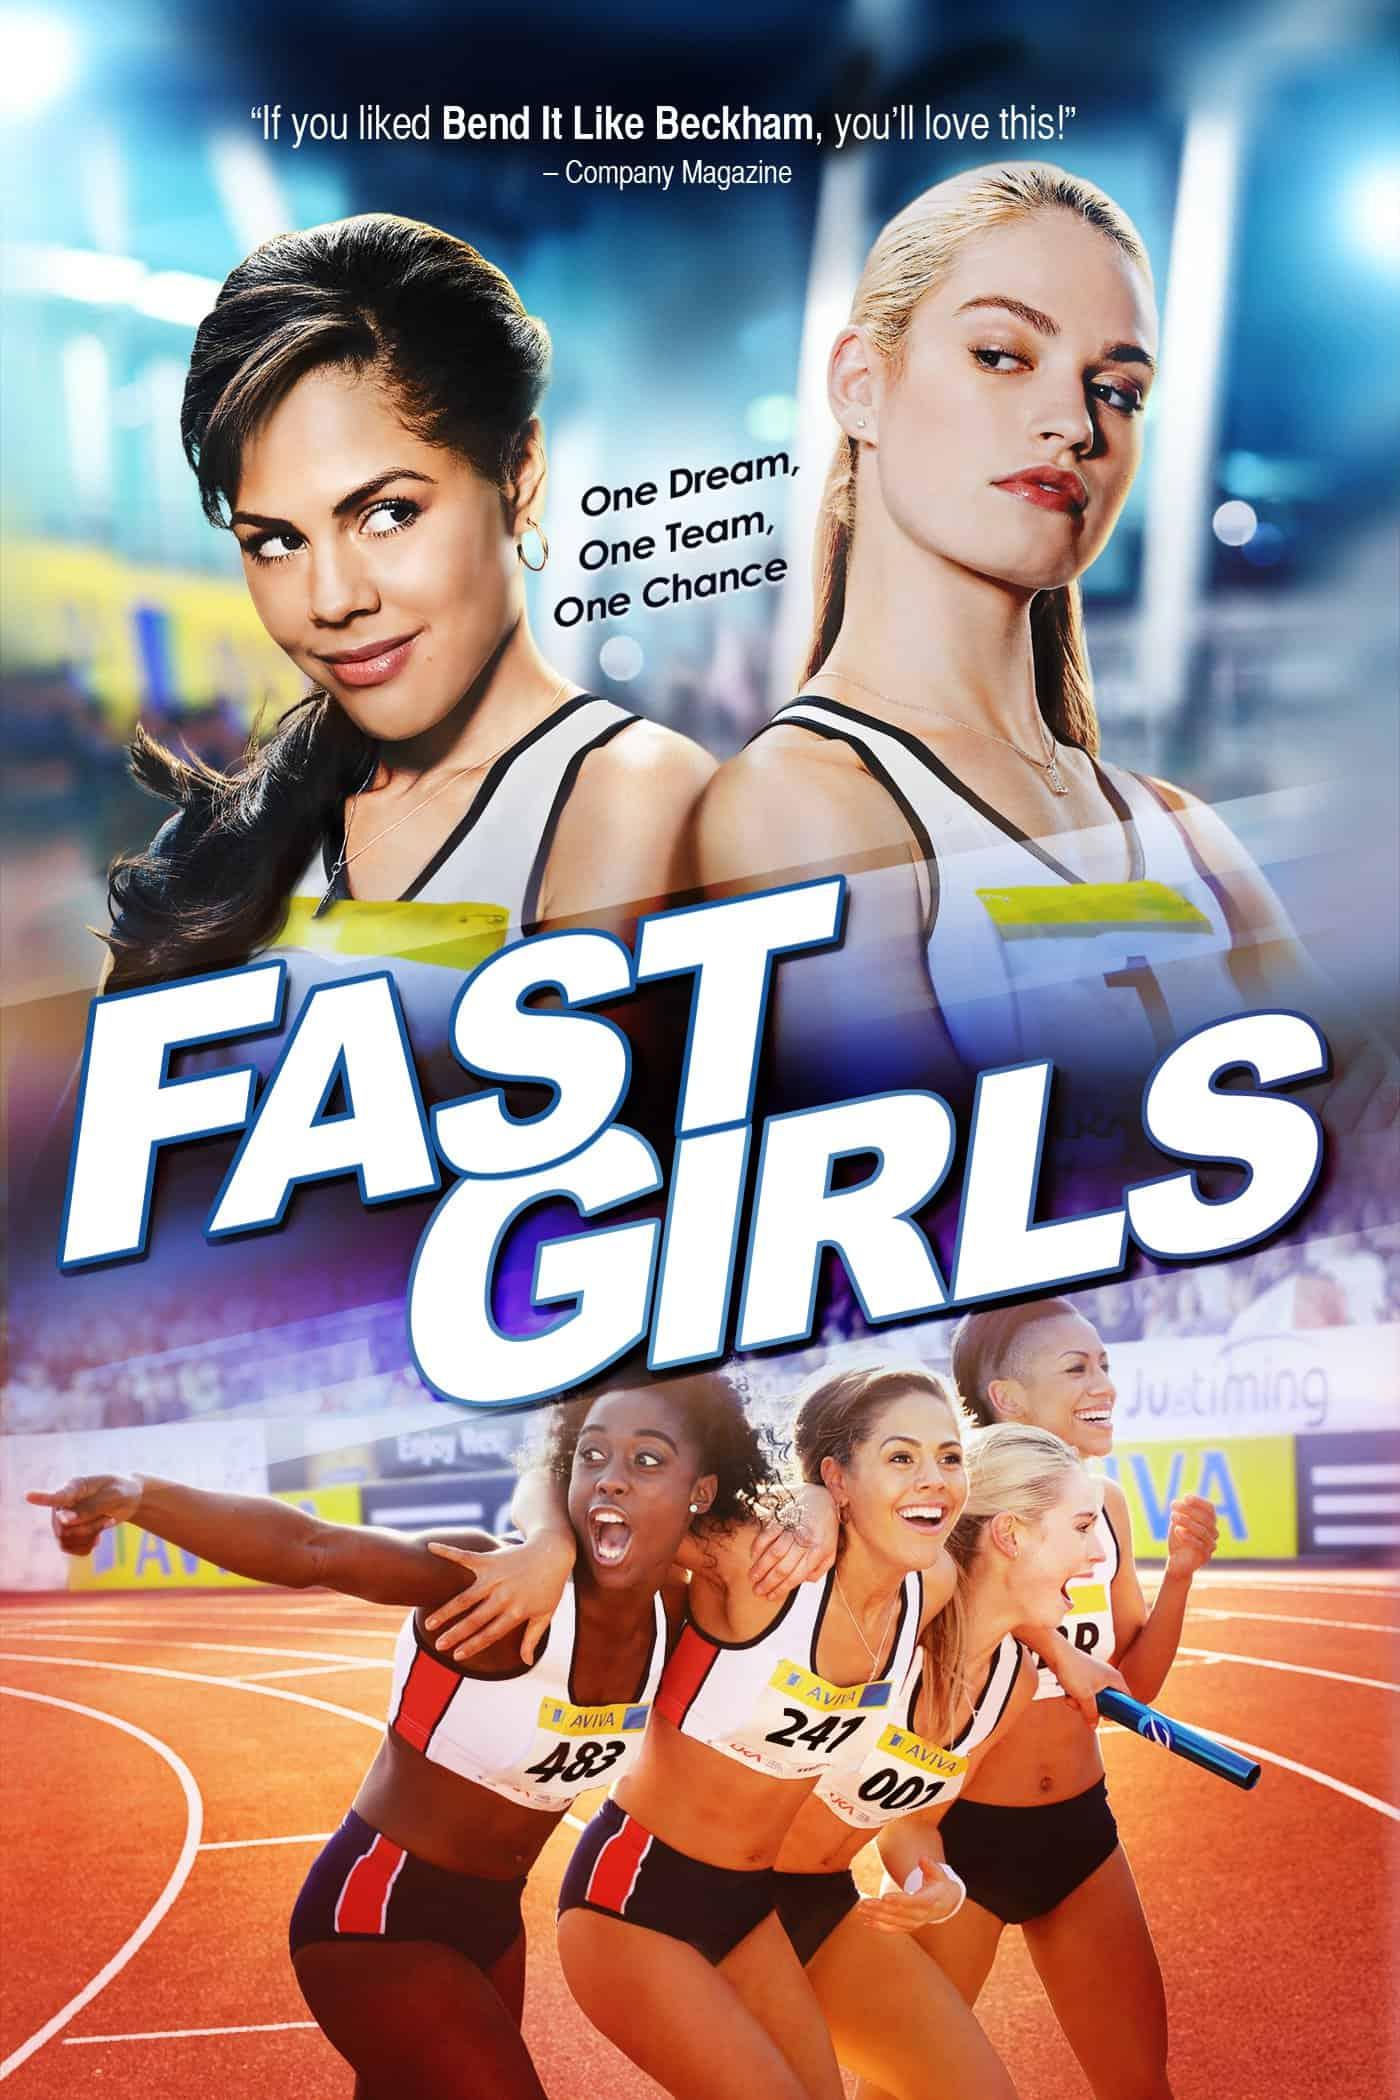 Fast Girls, 2012